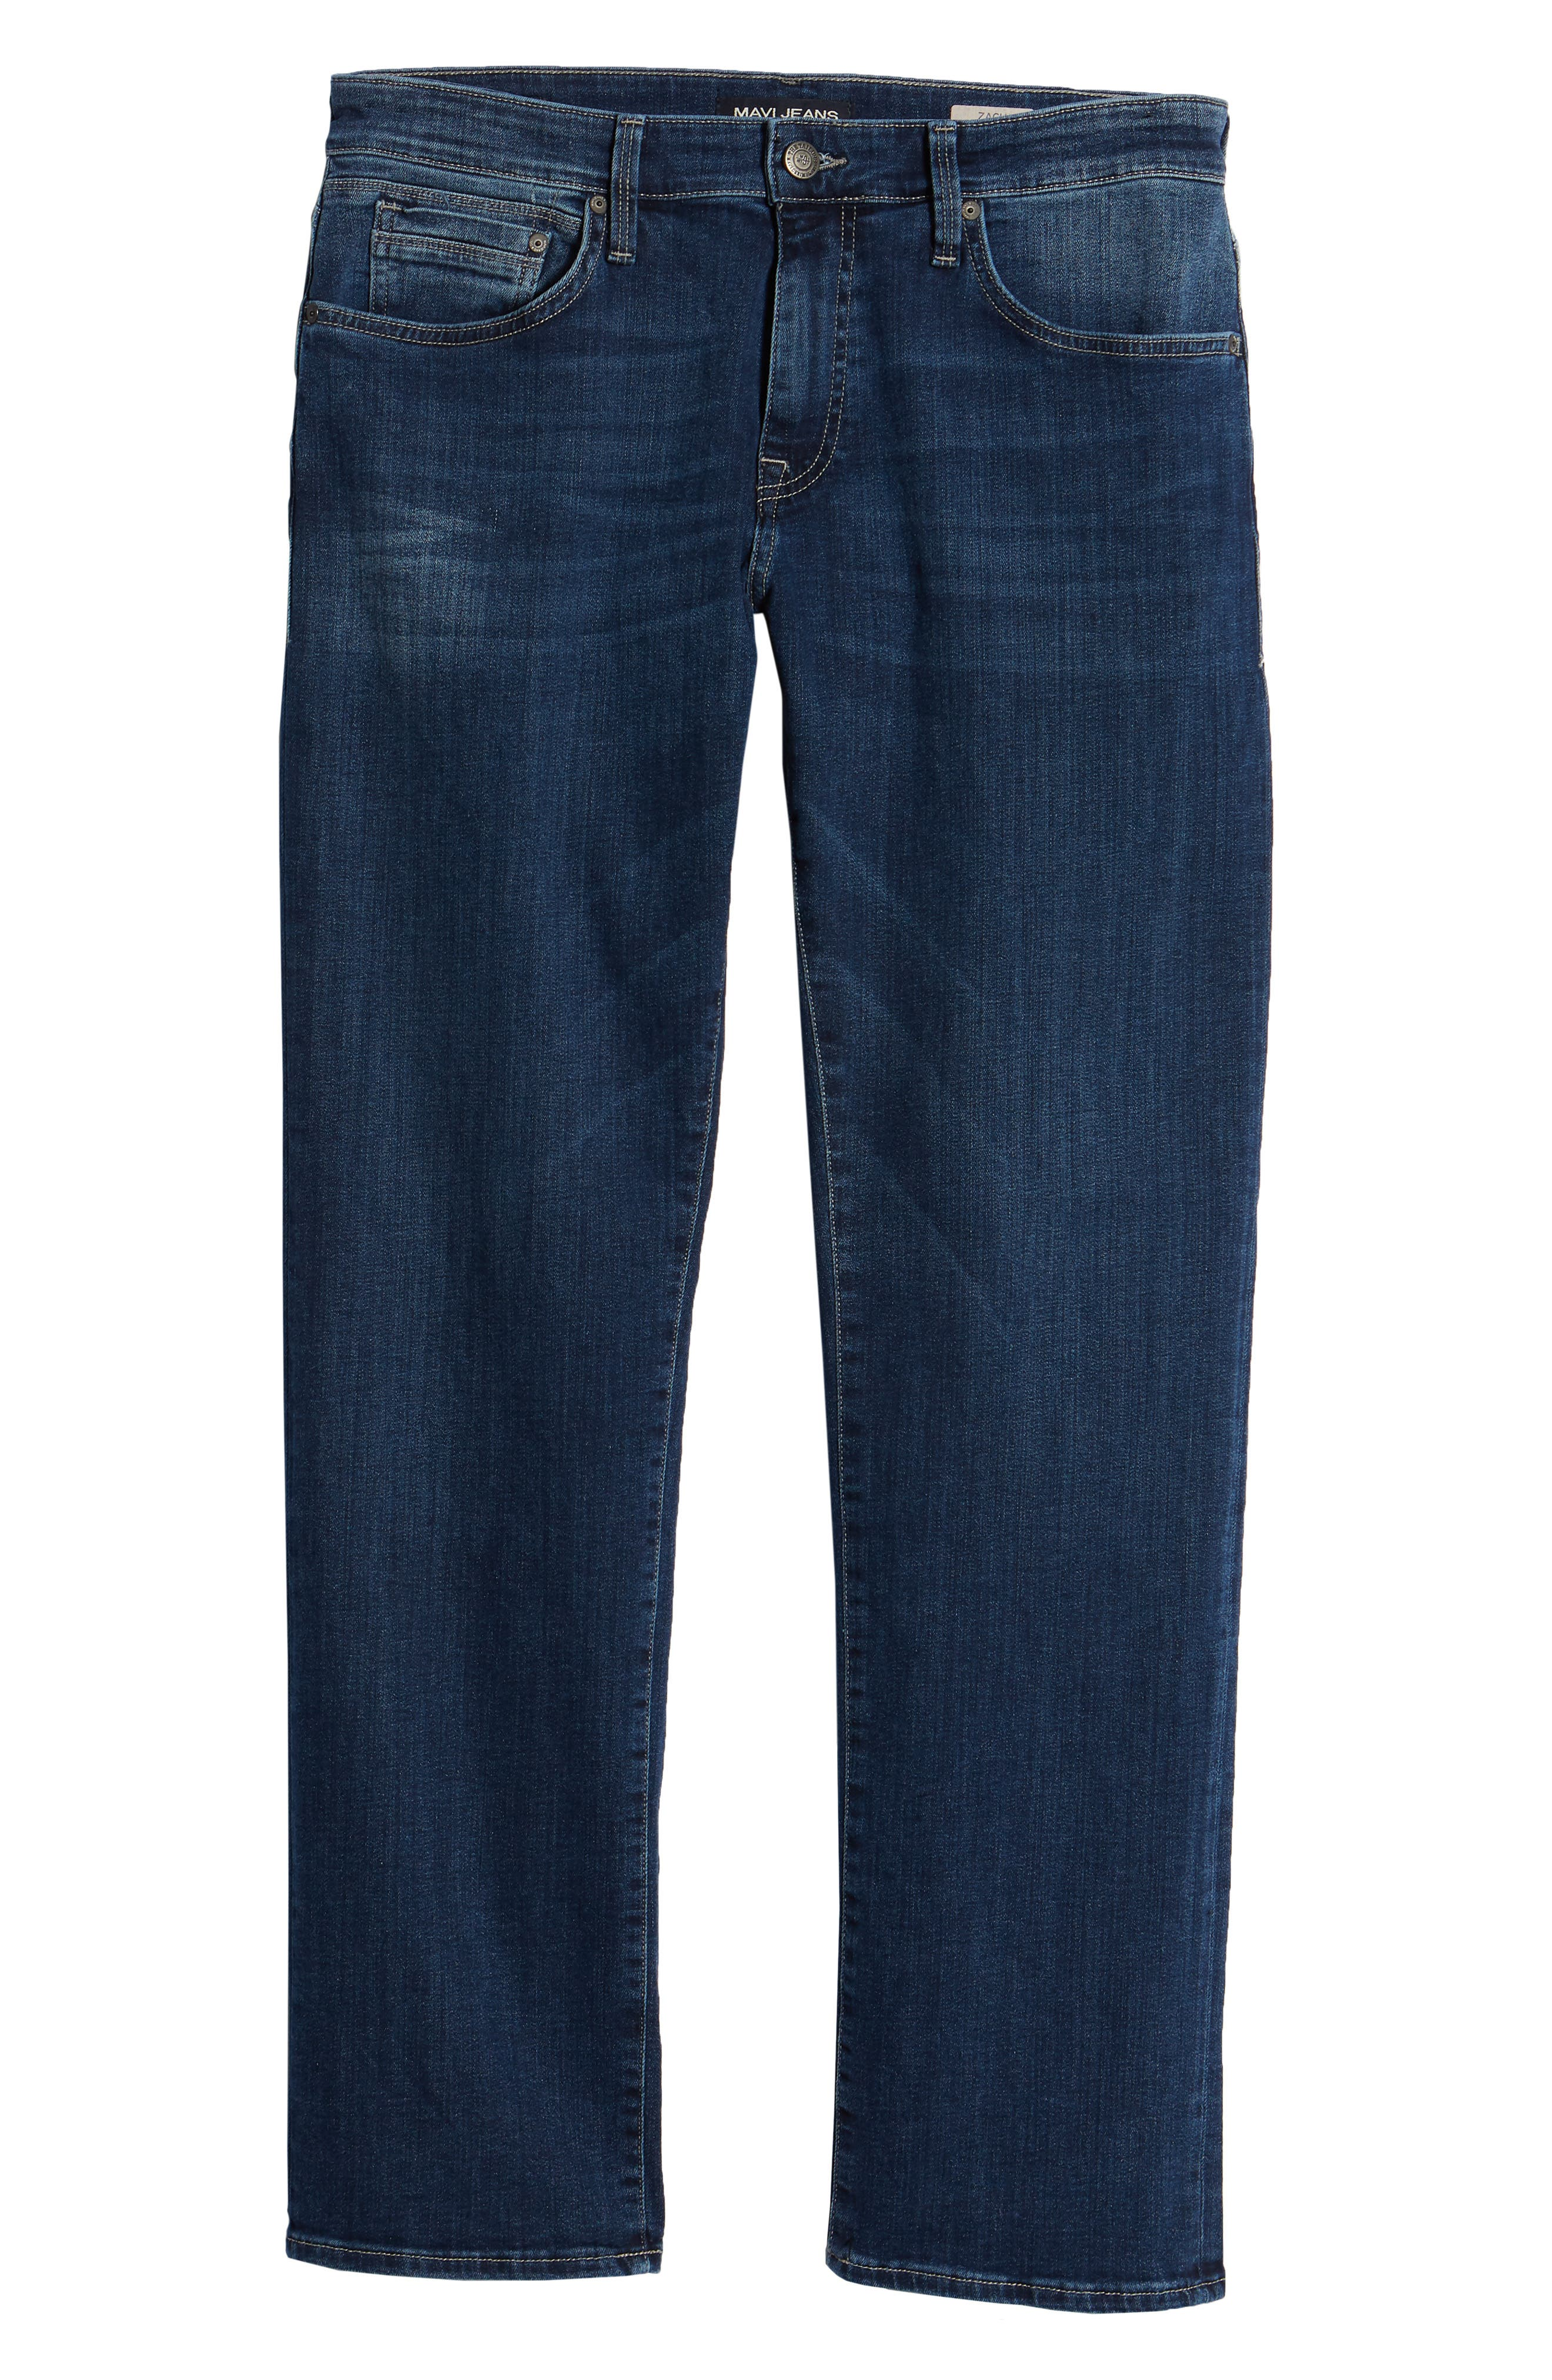 Zach Straight Leg Jeans,                             Alternate thumbnail 5, color,                             Dark Blue Williamsburg